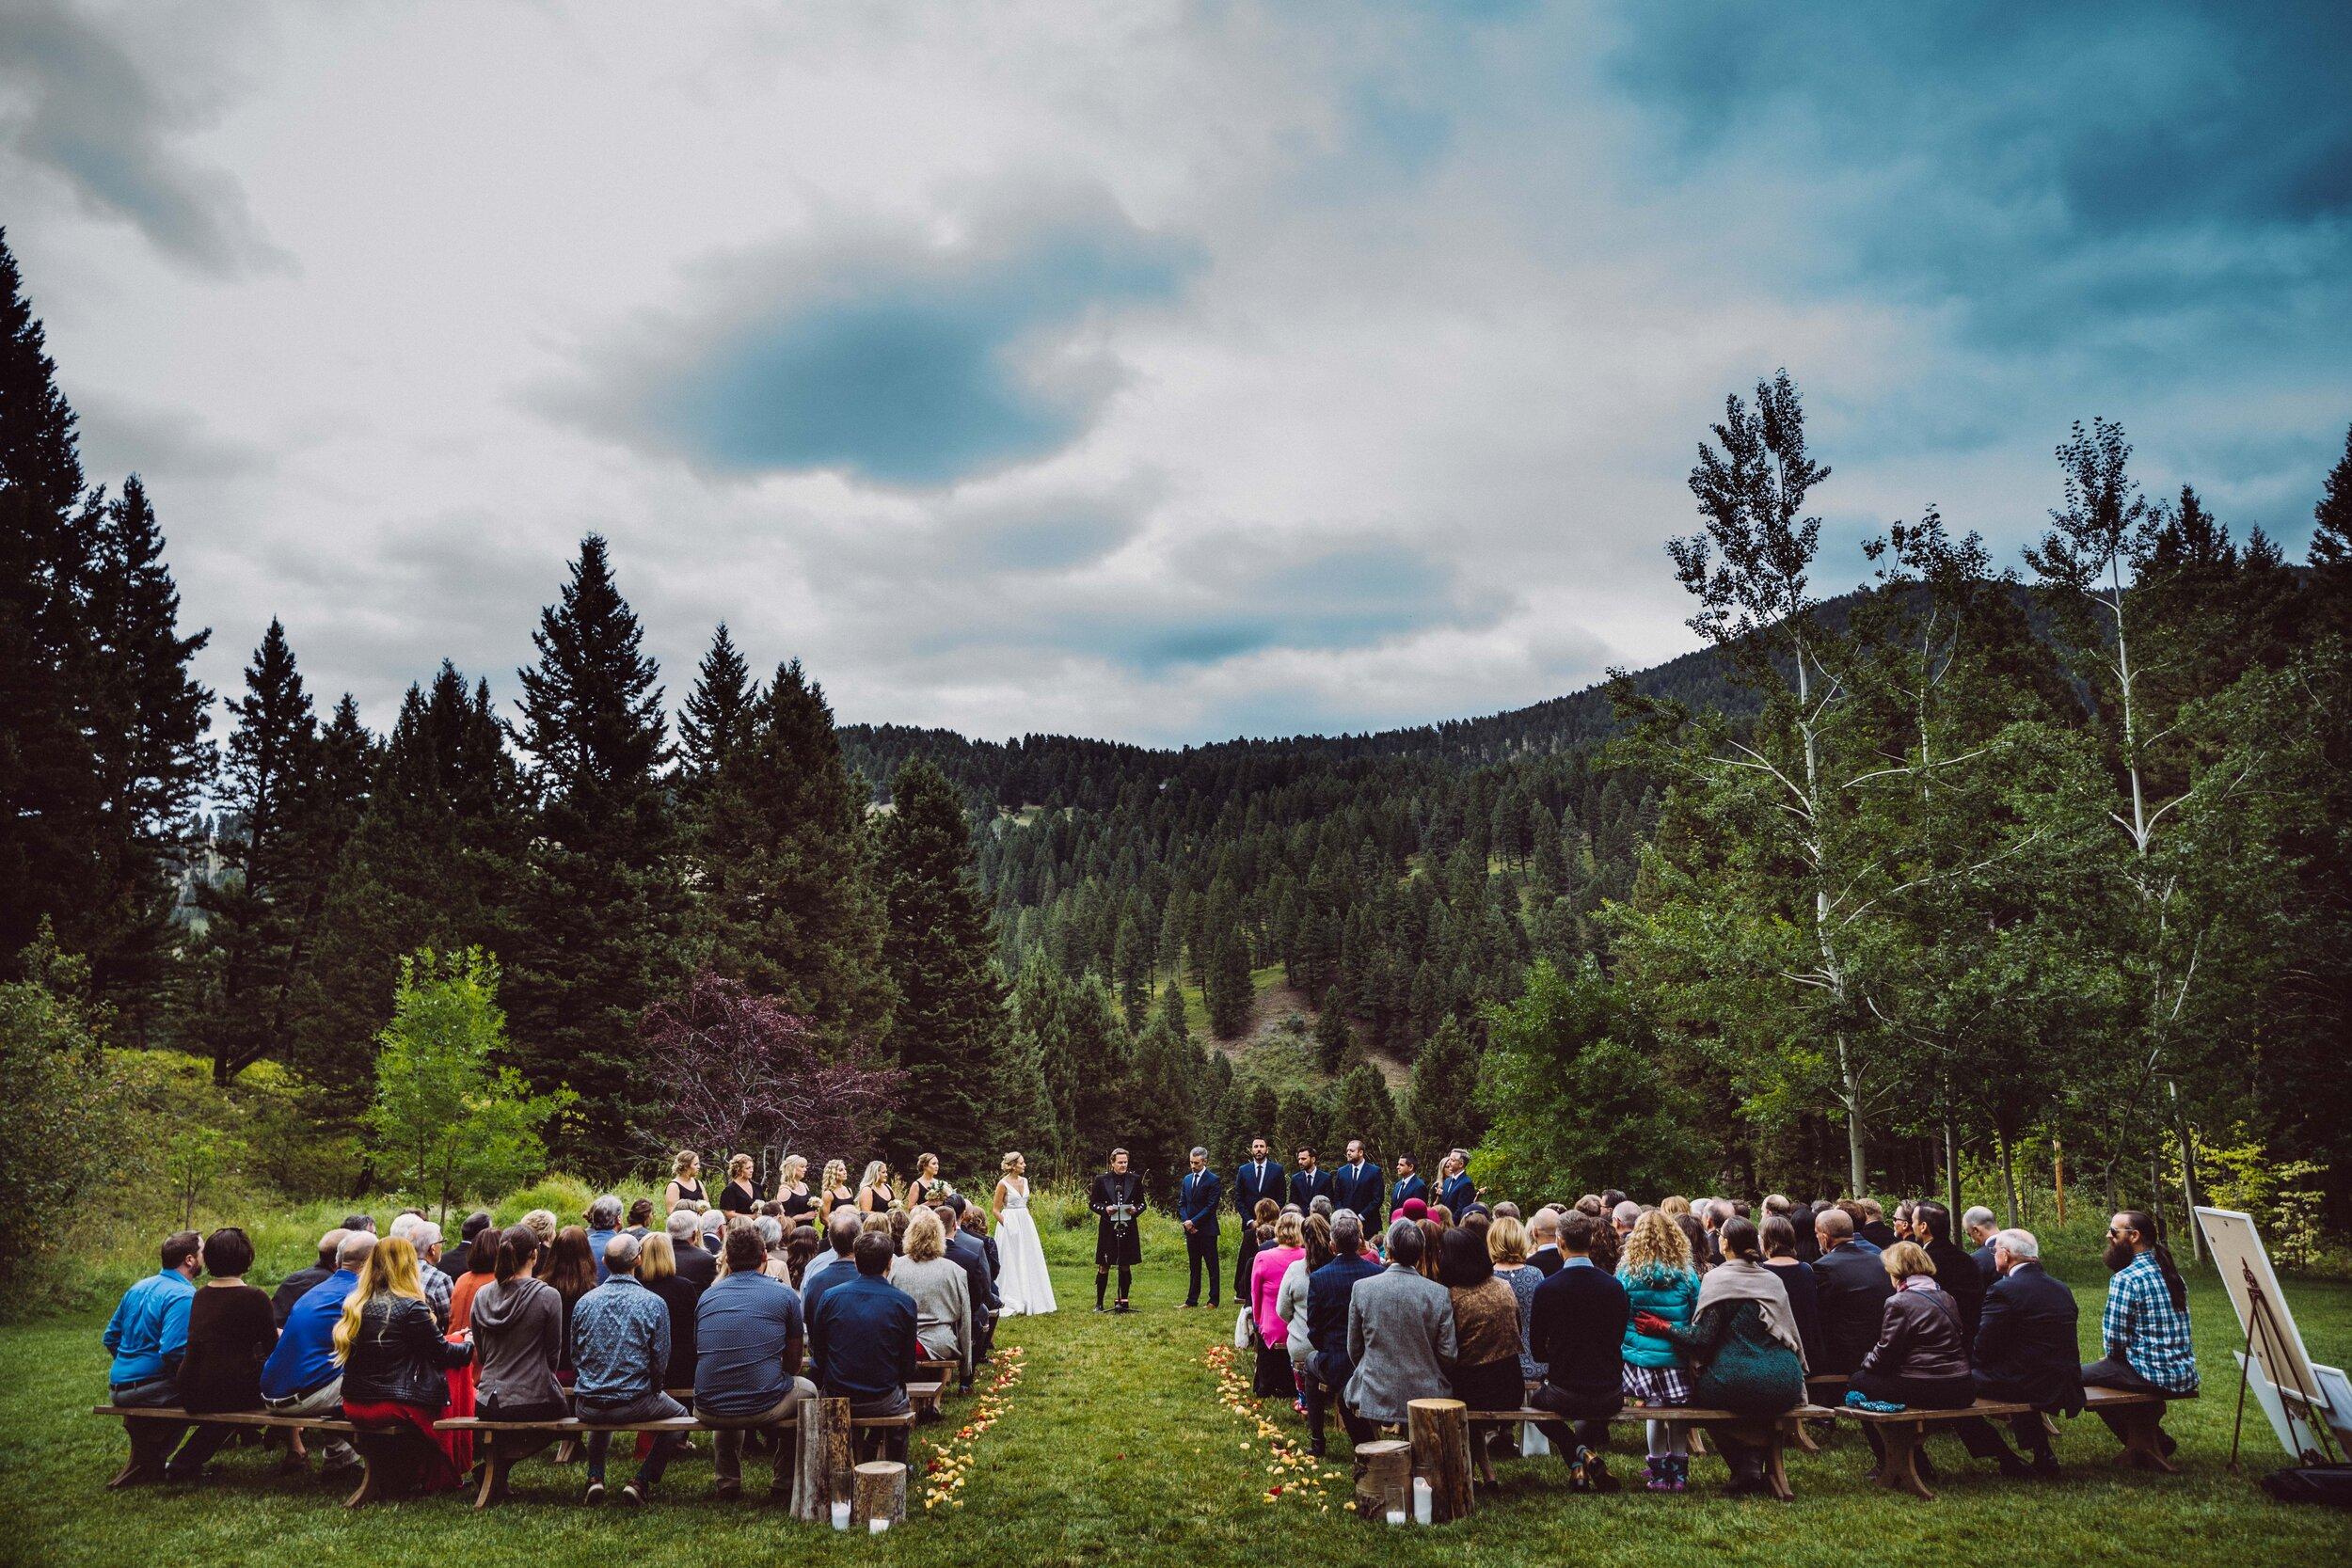 kent-wedding-photography-105125.jpg